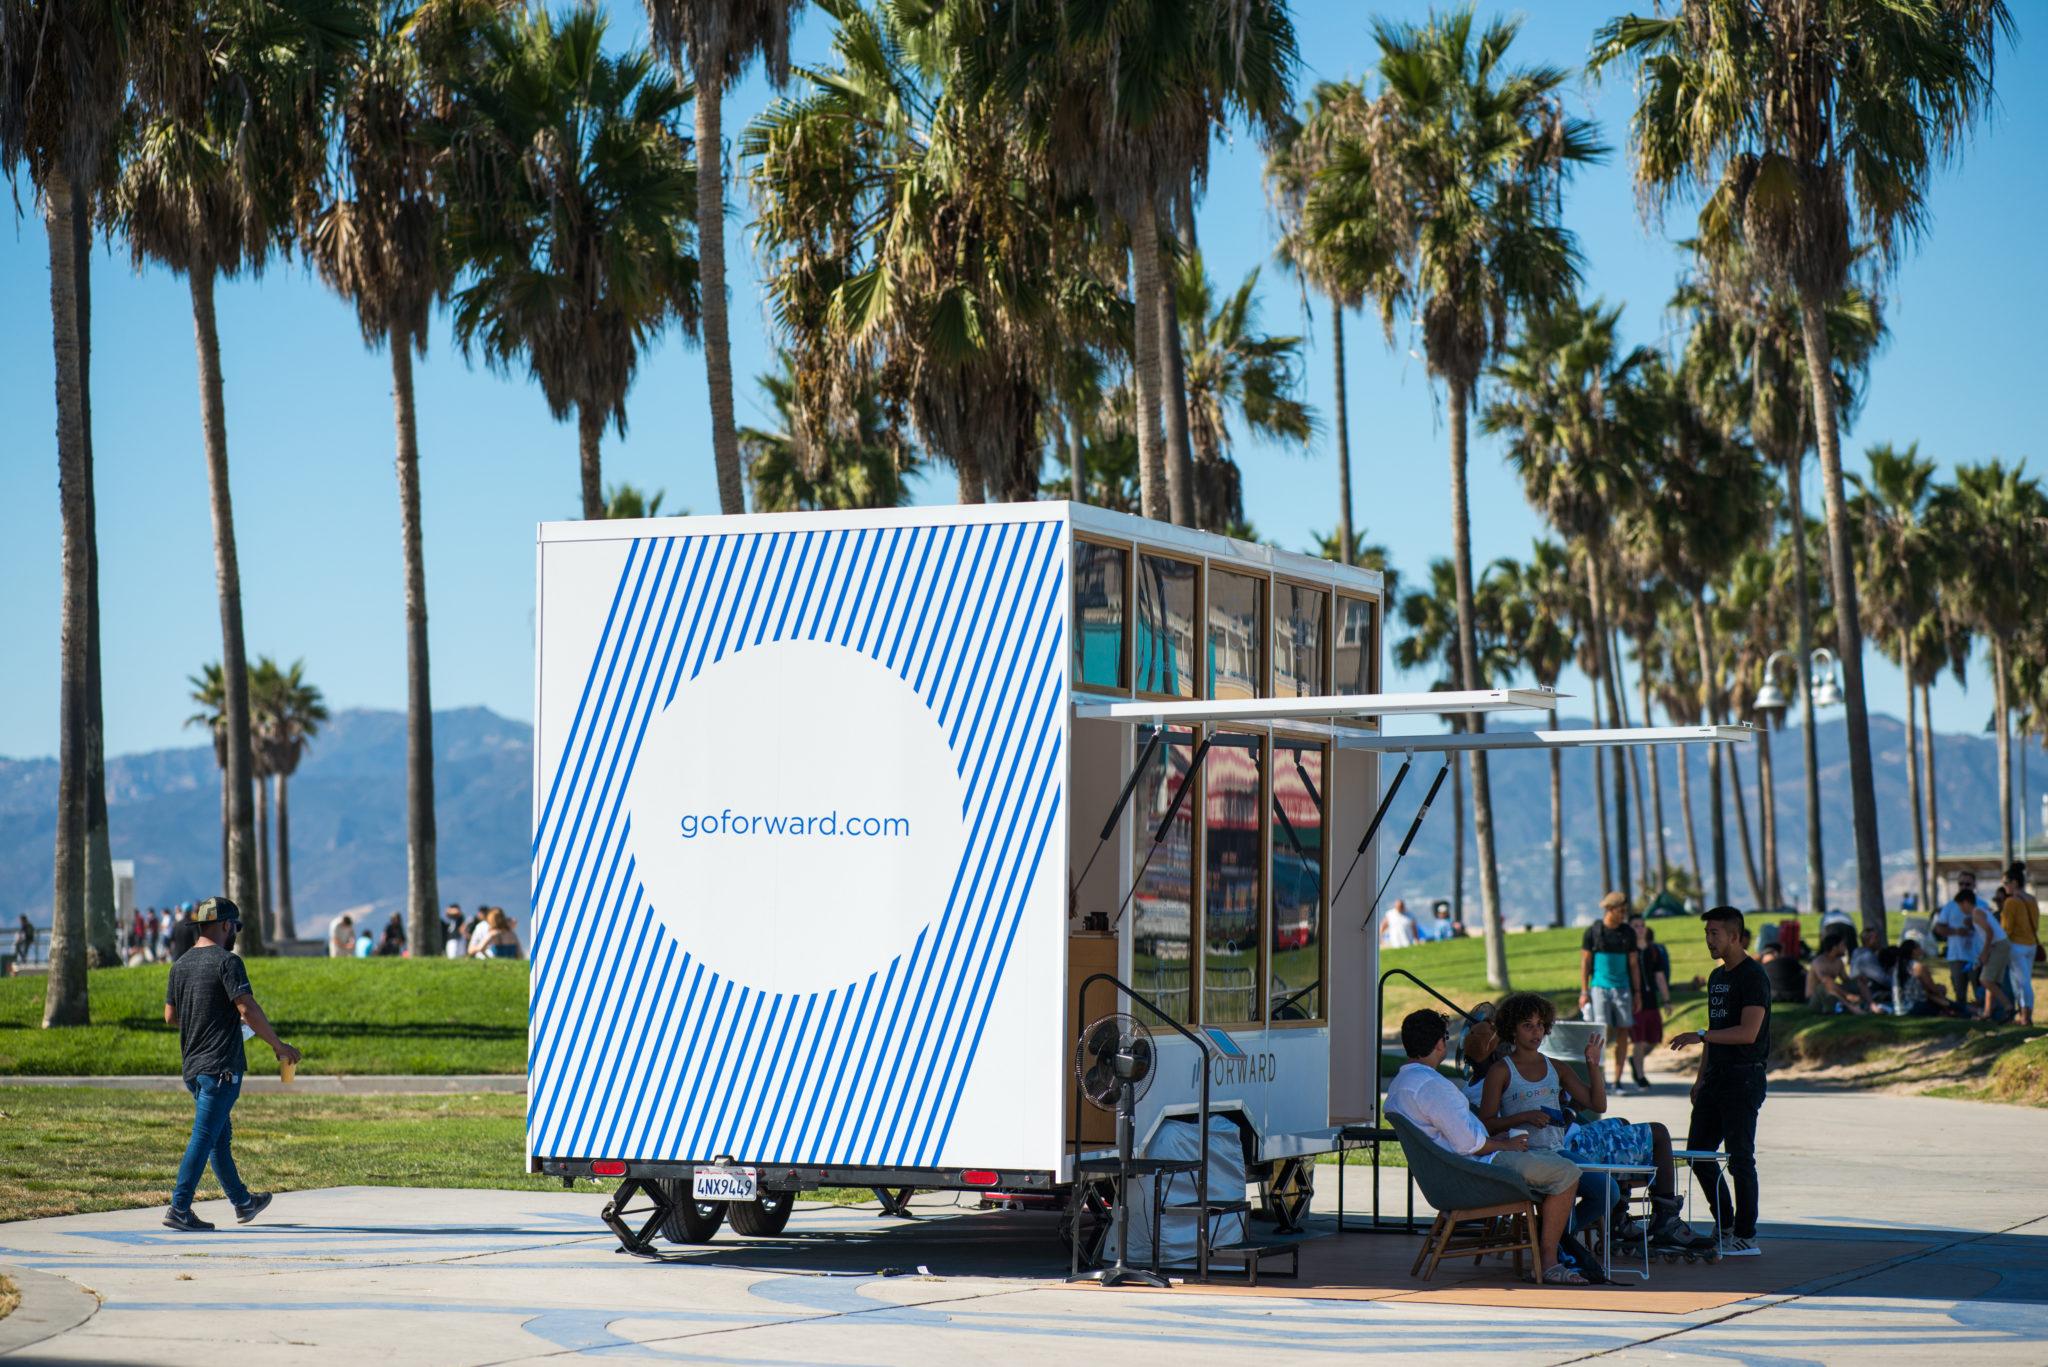 Forward Medical Healthcare Startup Subscription - Google - Venice Beach, Experiential Marketing Agency